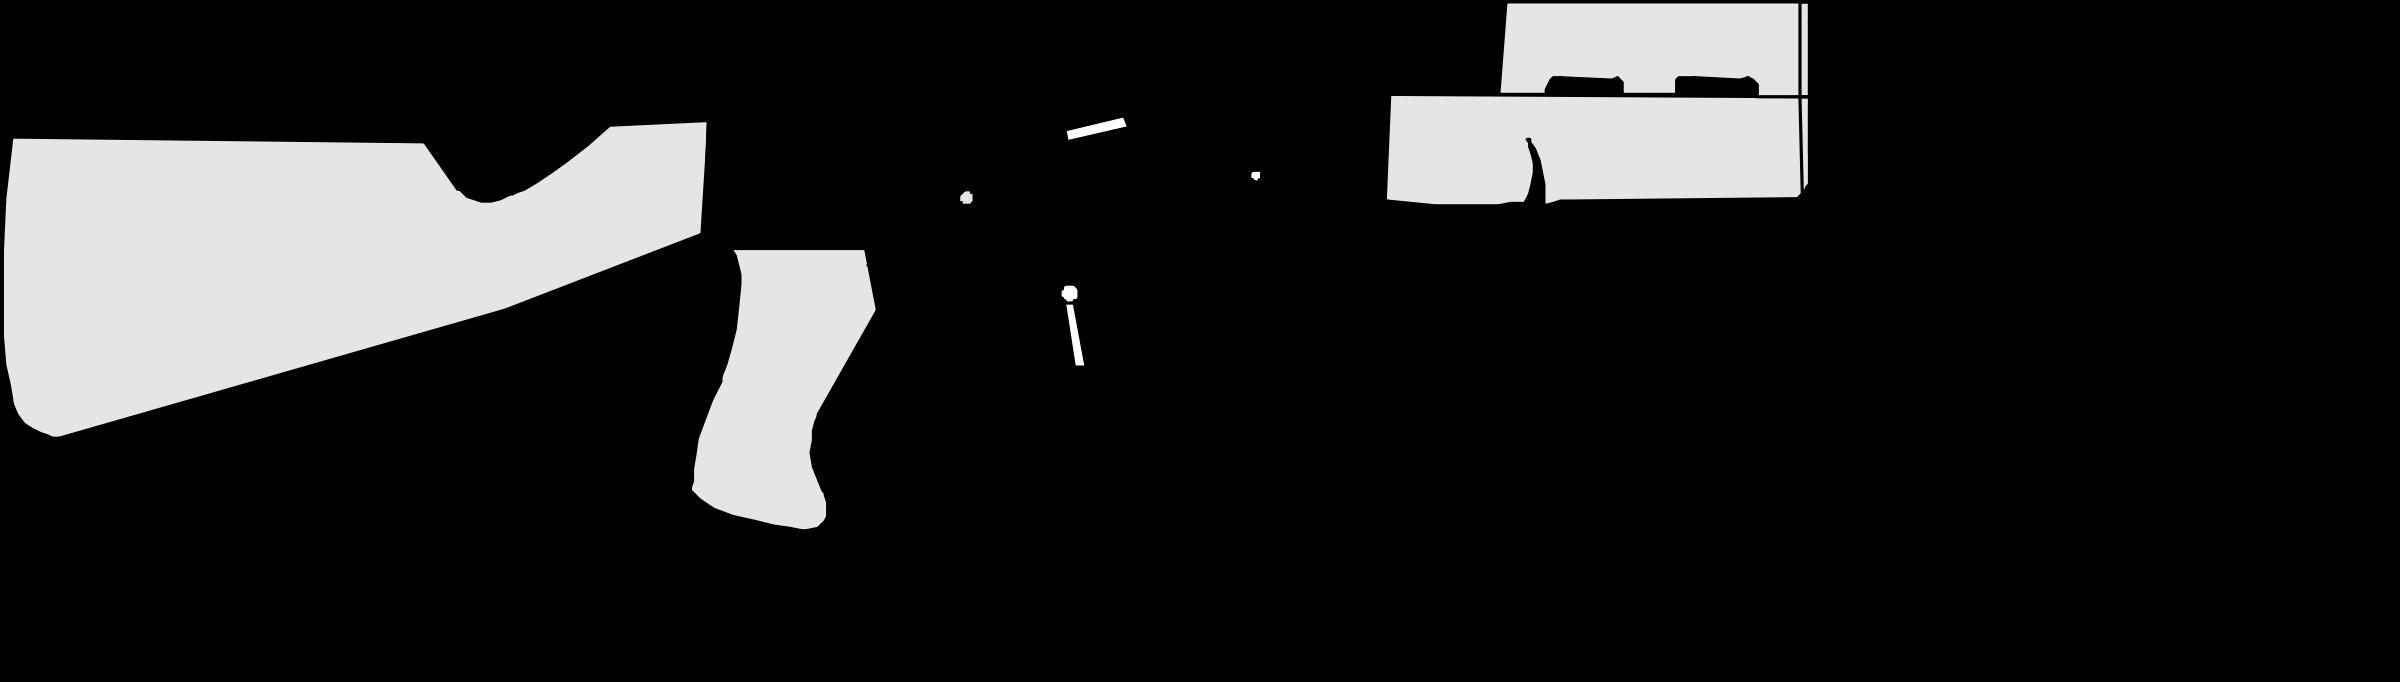 Раскраска автомат калашникова